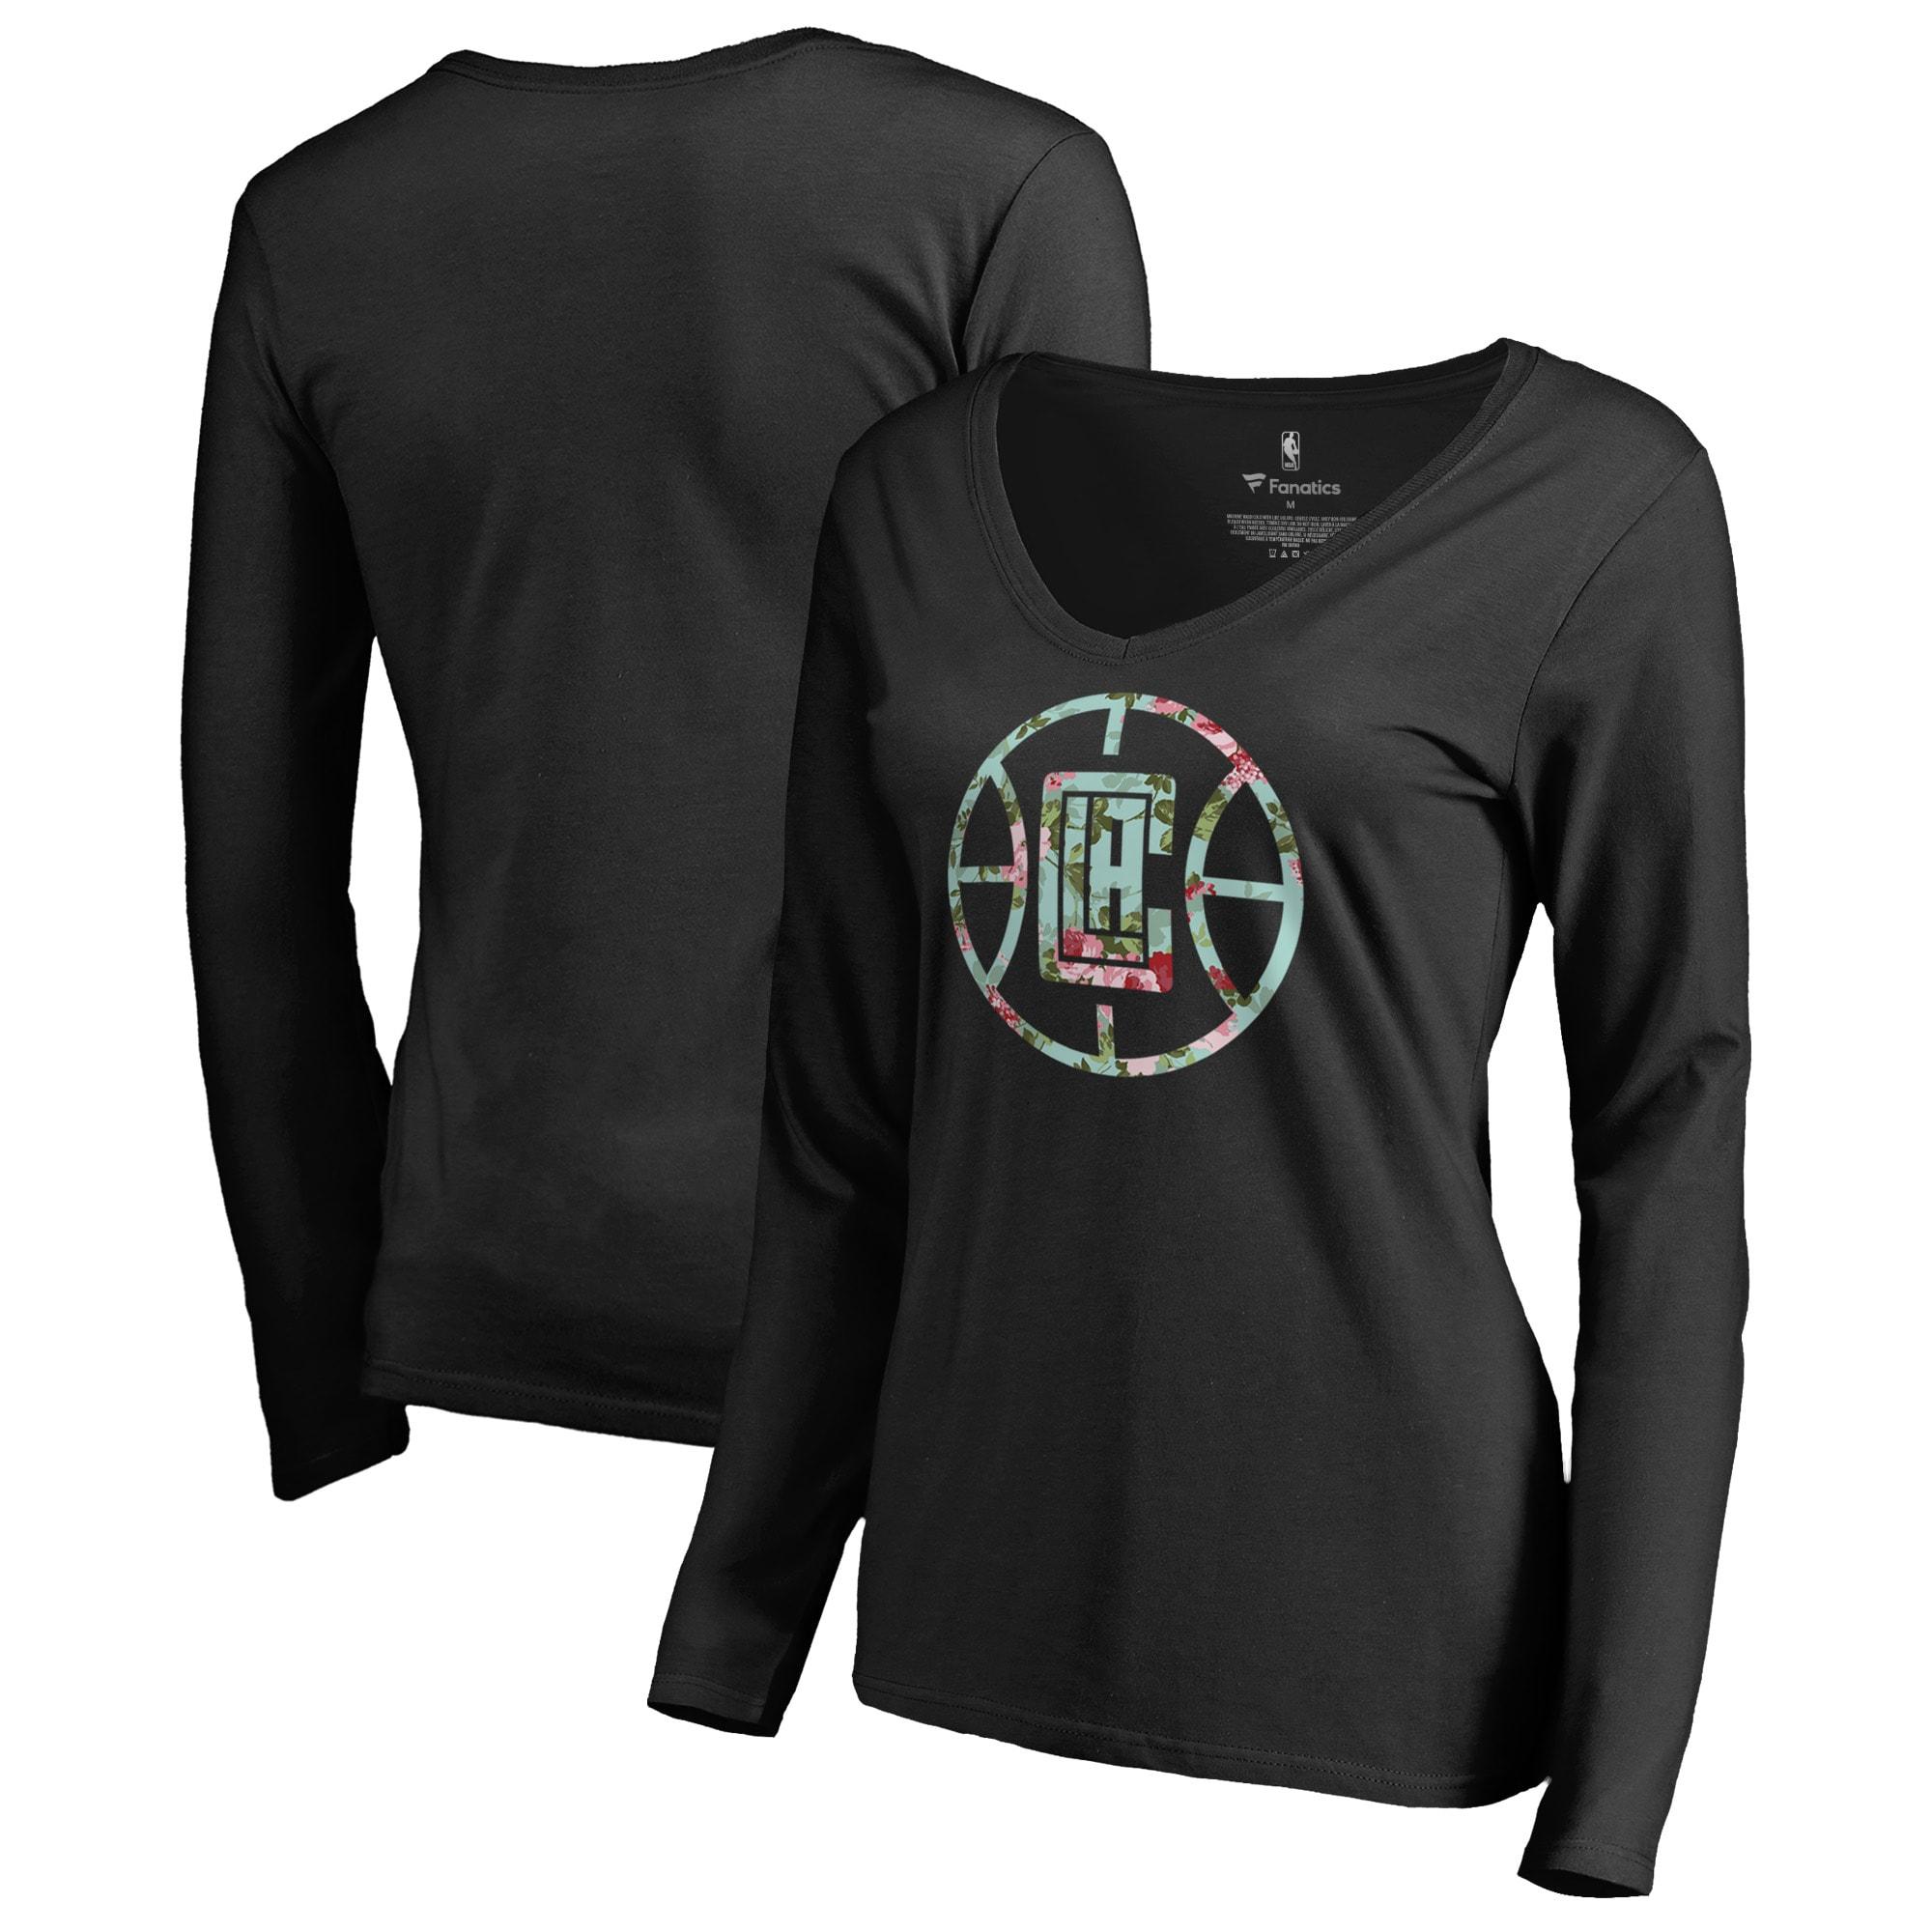 LA Clippers Fanatics Branded Women's Lovely V-Neck Long Sleeve T-Shirt - Black